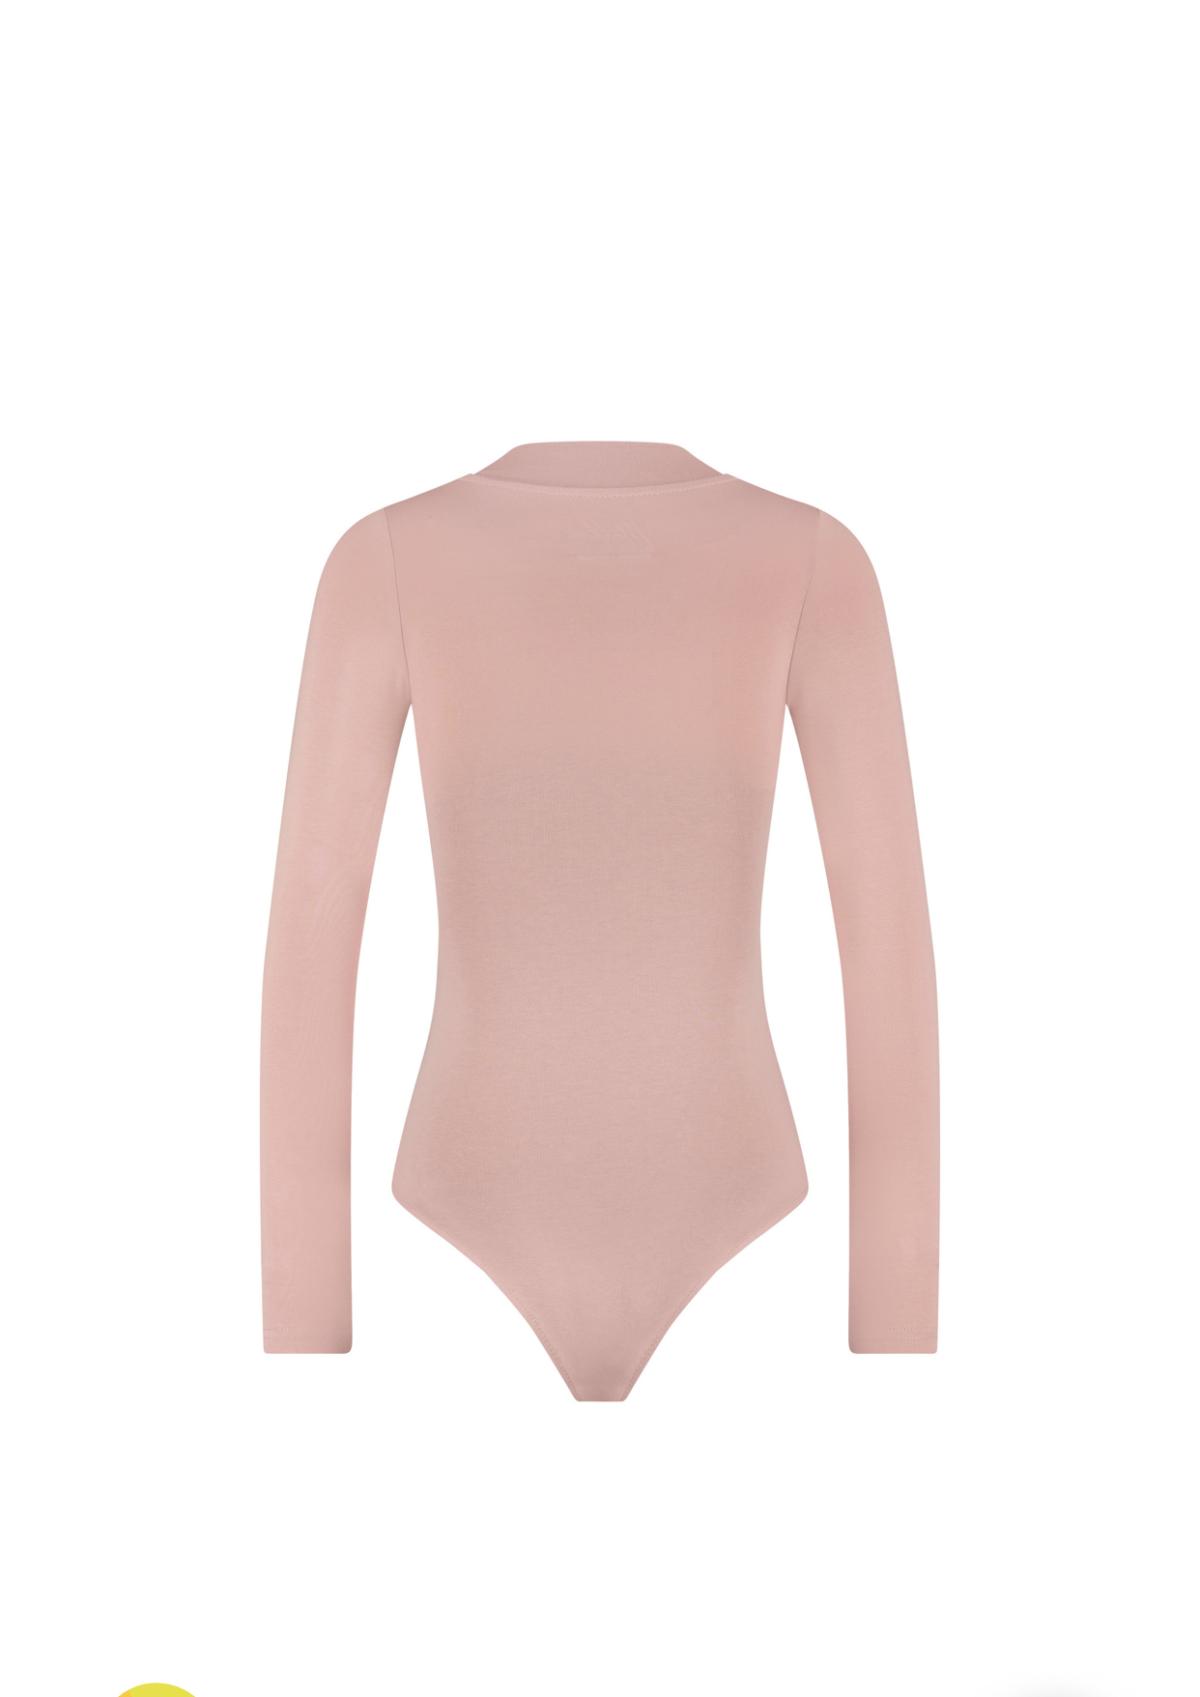 Malelions Women Bodysuit – Mauve/Dark Antra